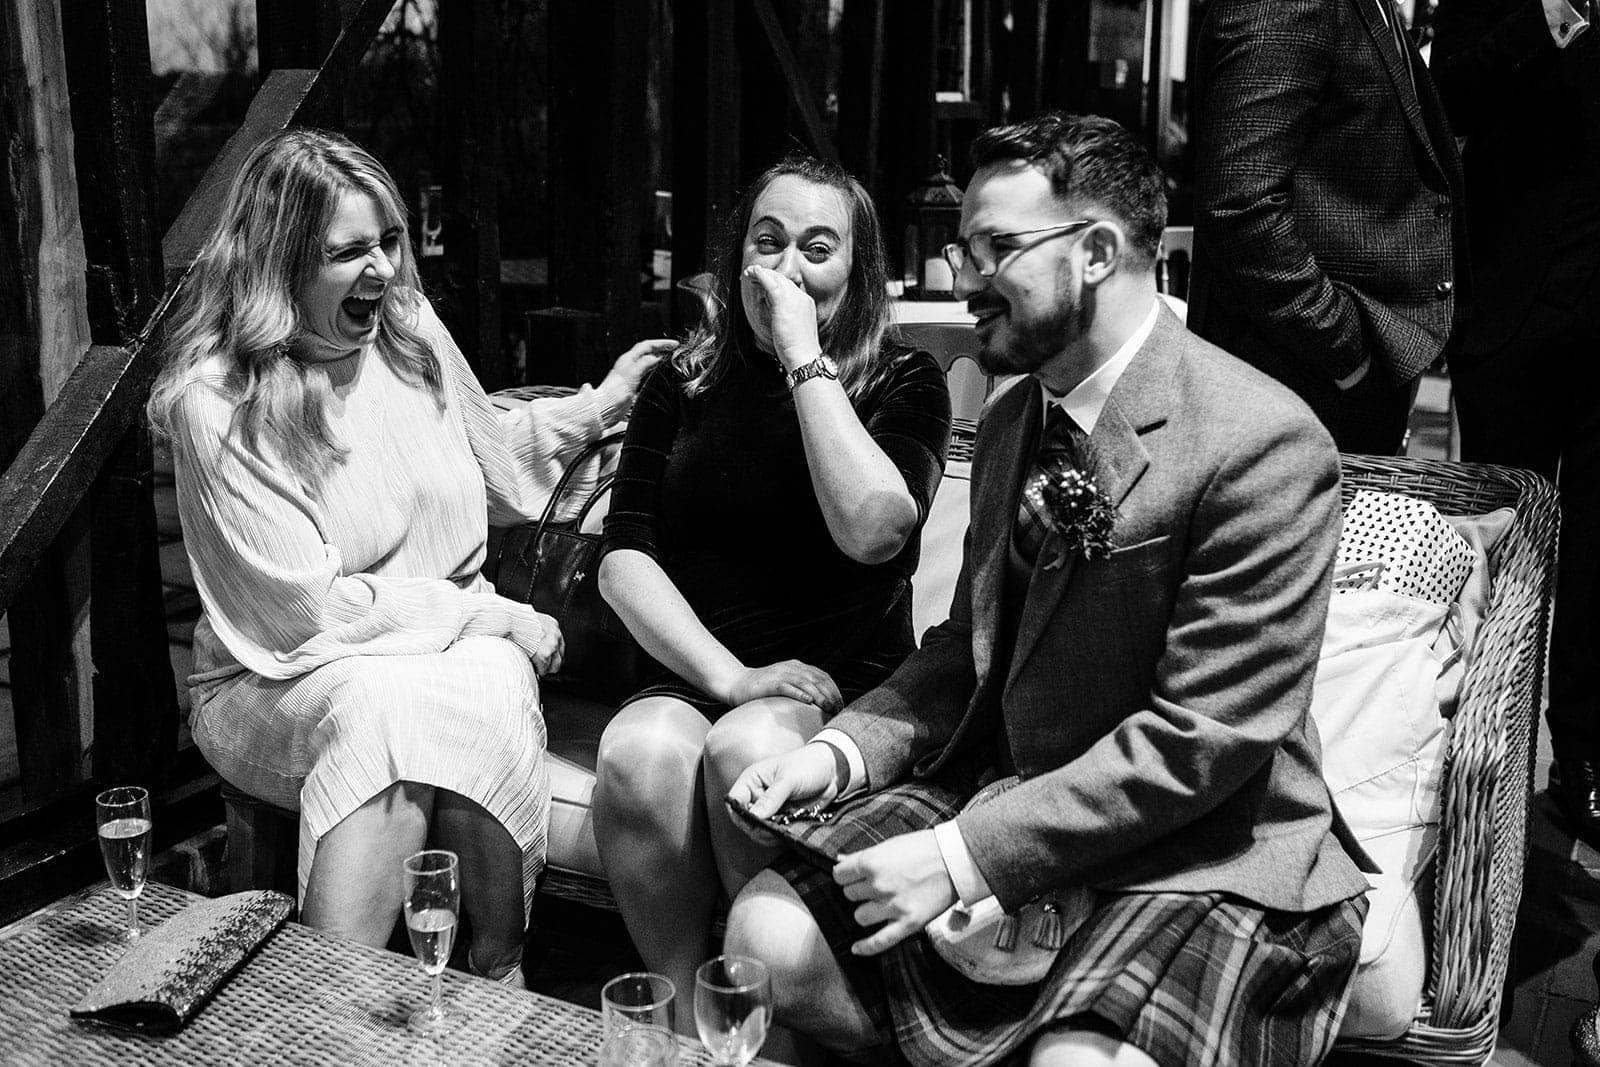 Wedding guests having a laugh